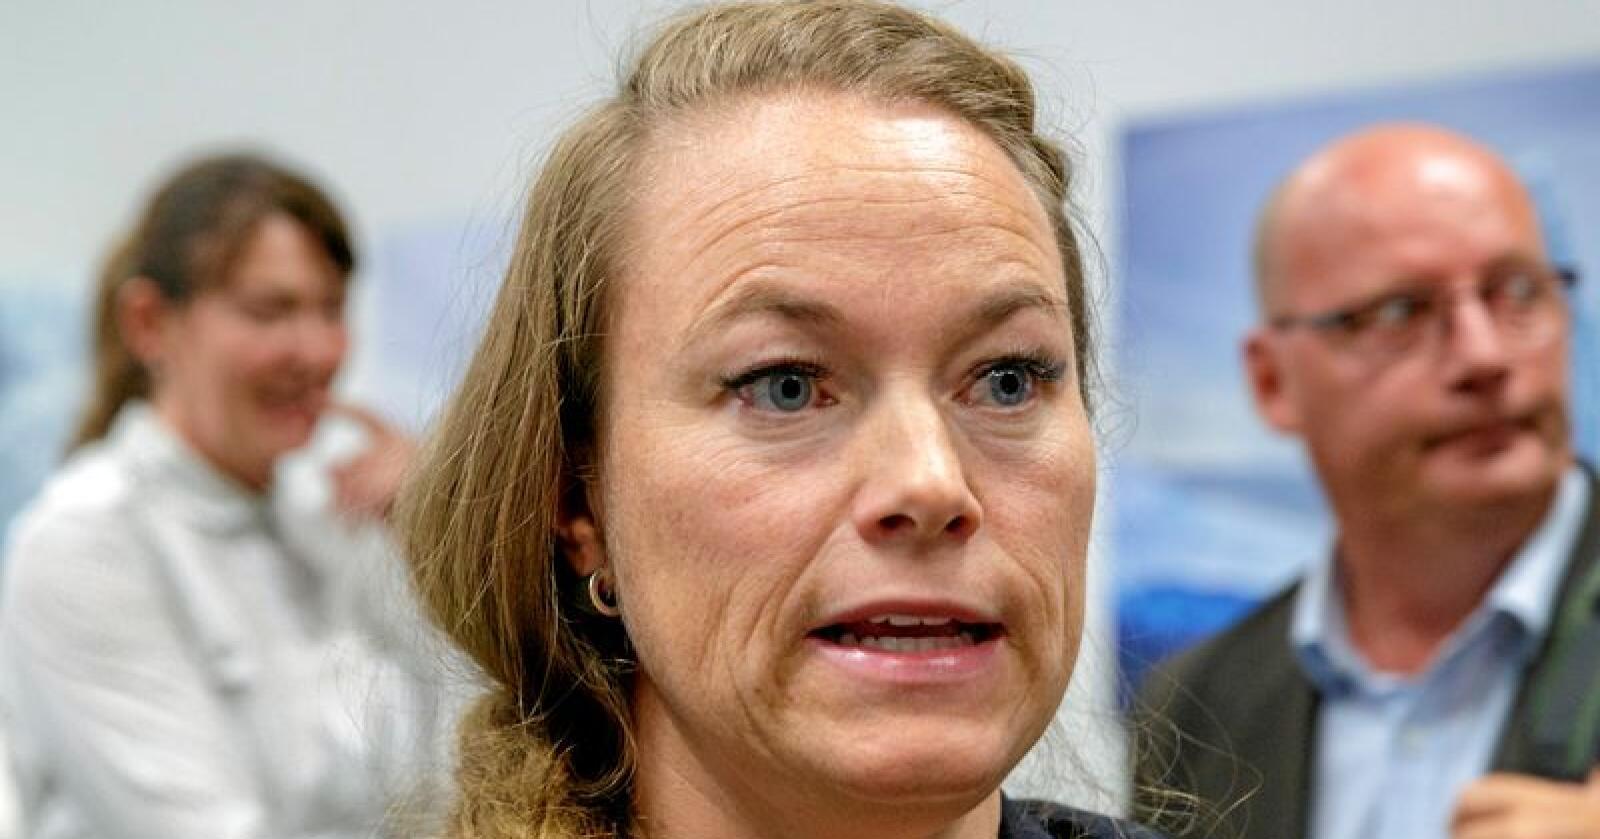 Kari Anita Furunes (Sp) er ordfører i Meråker kommune. Foto: Cornelius Poppe / NTB scanpix